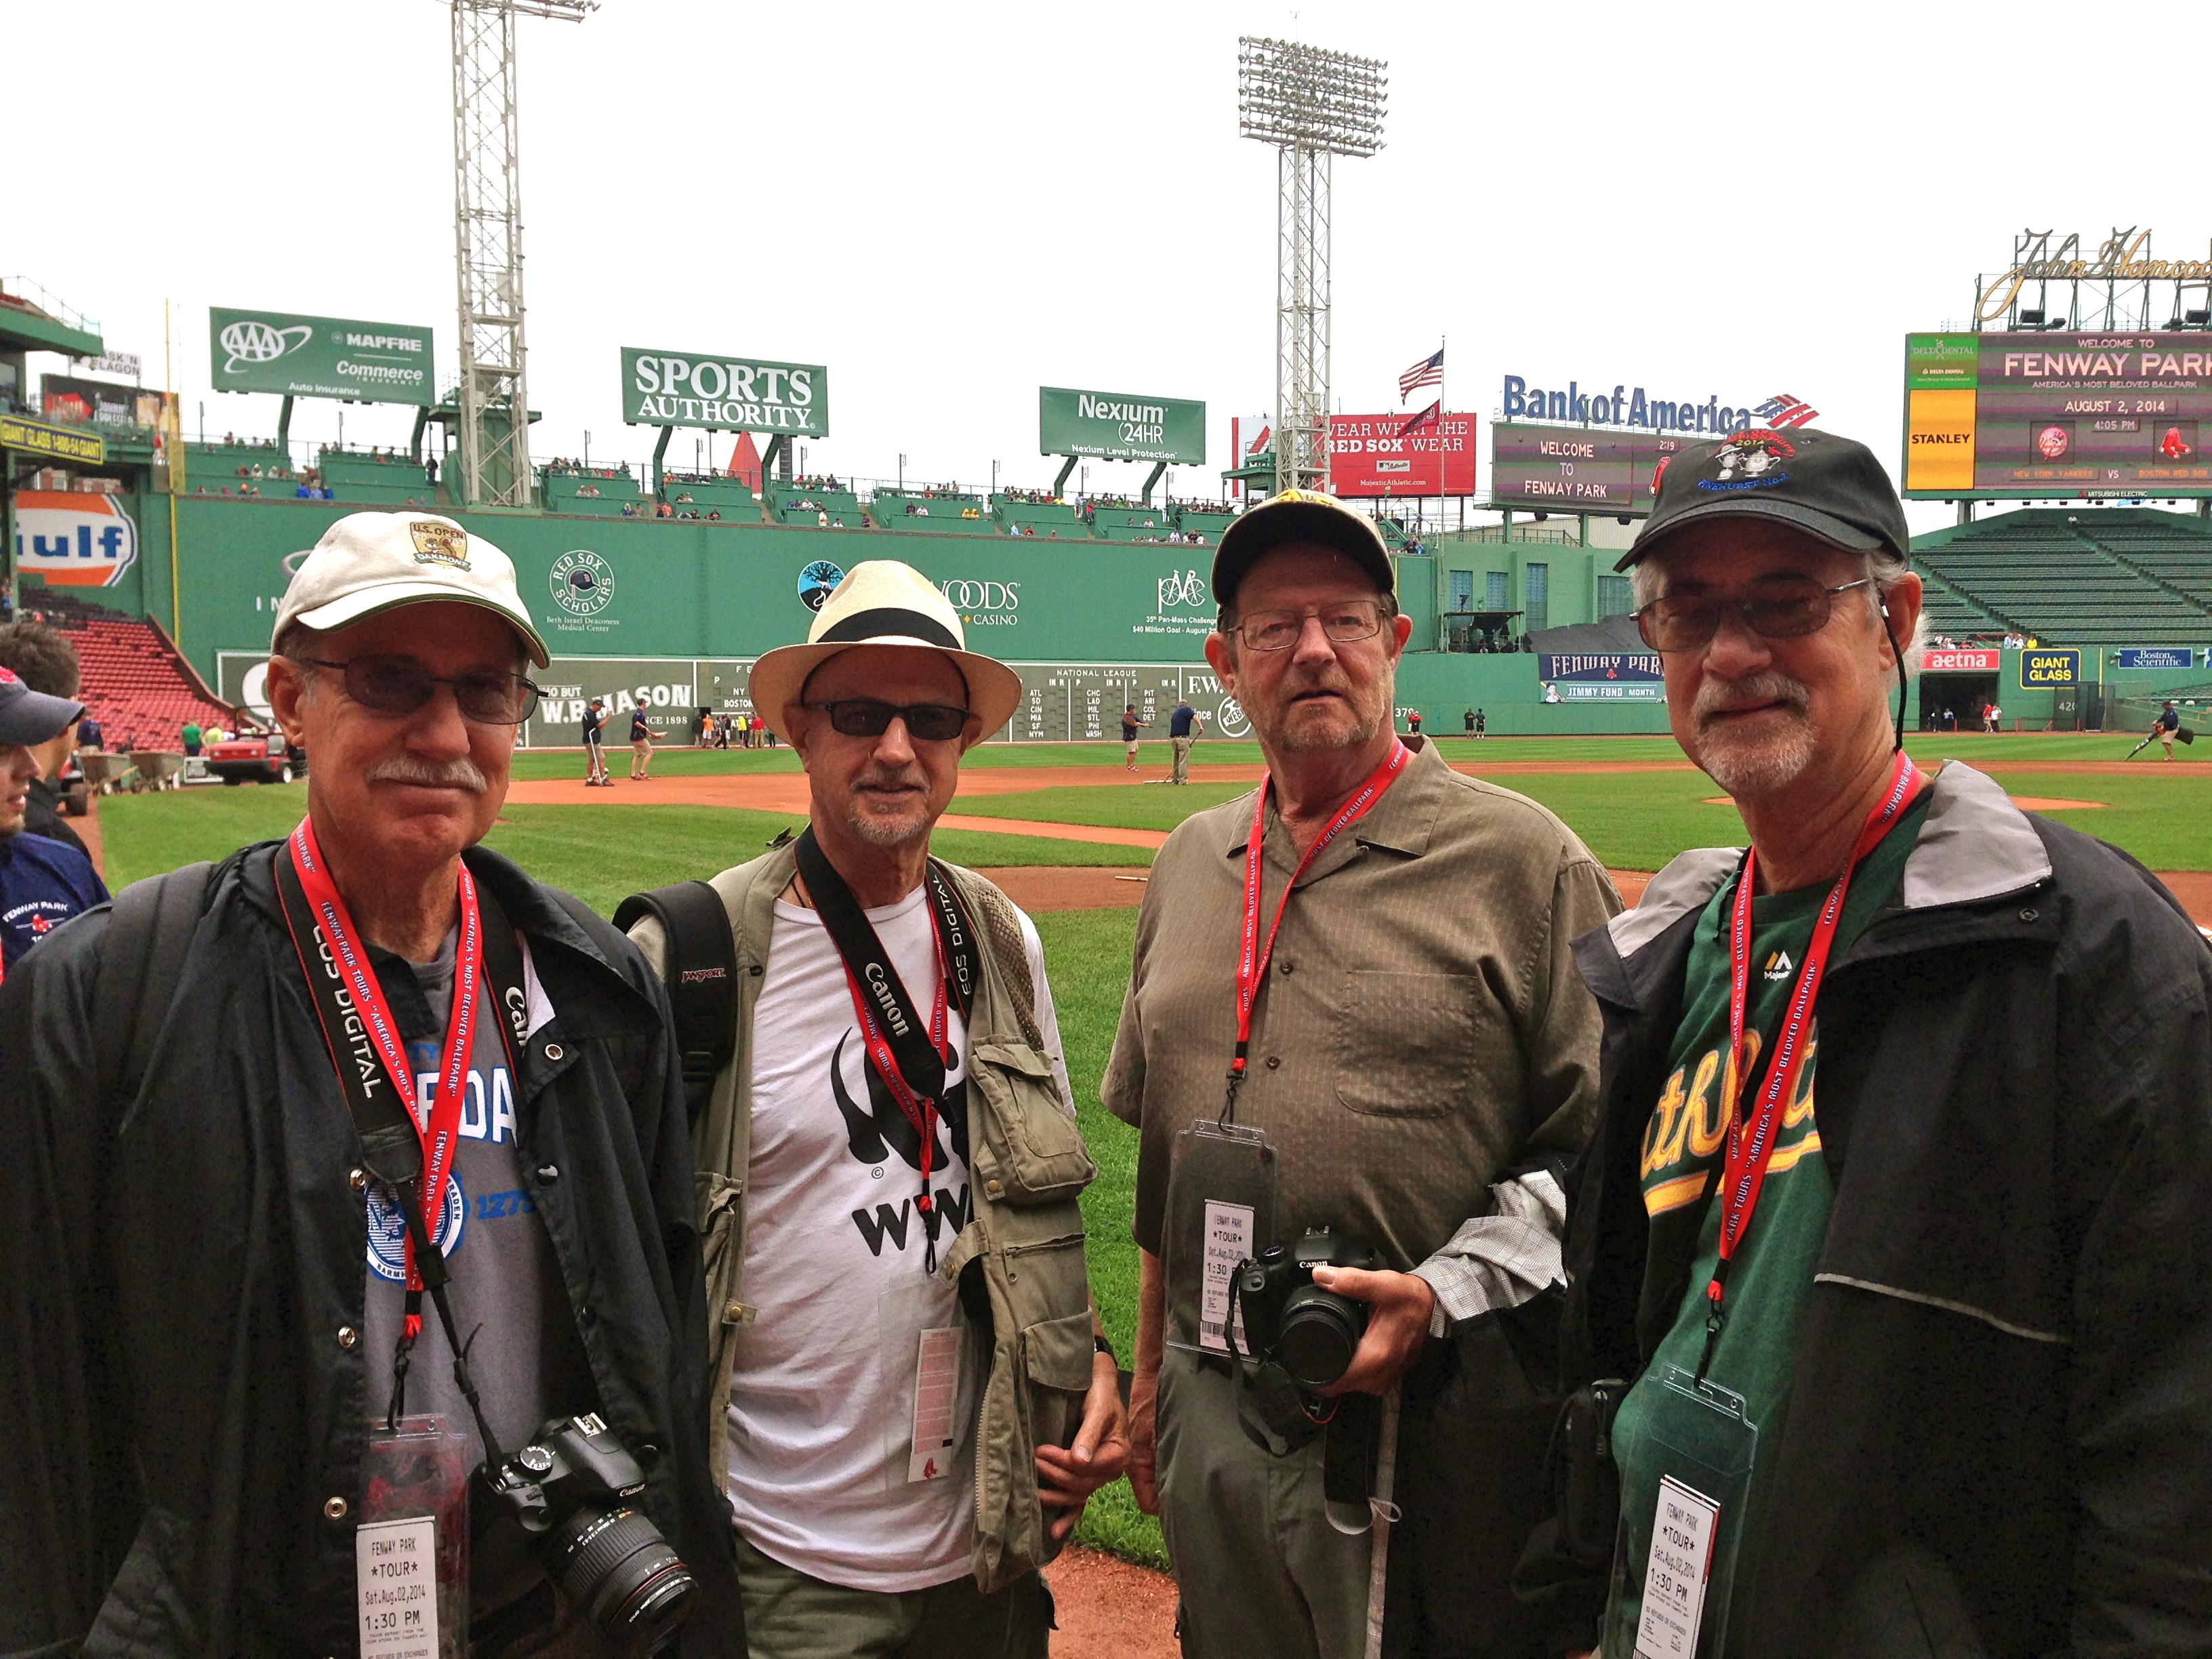 Fenway Park,baseball bucket List,baseball stadium tour